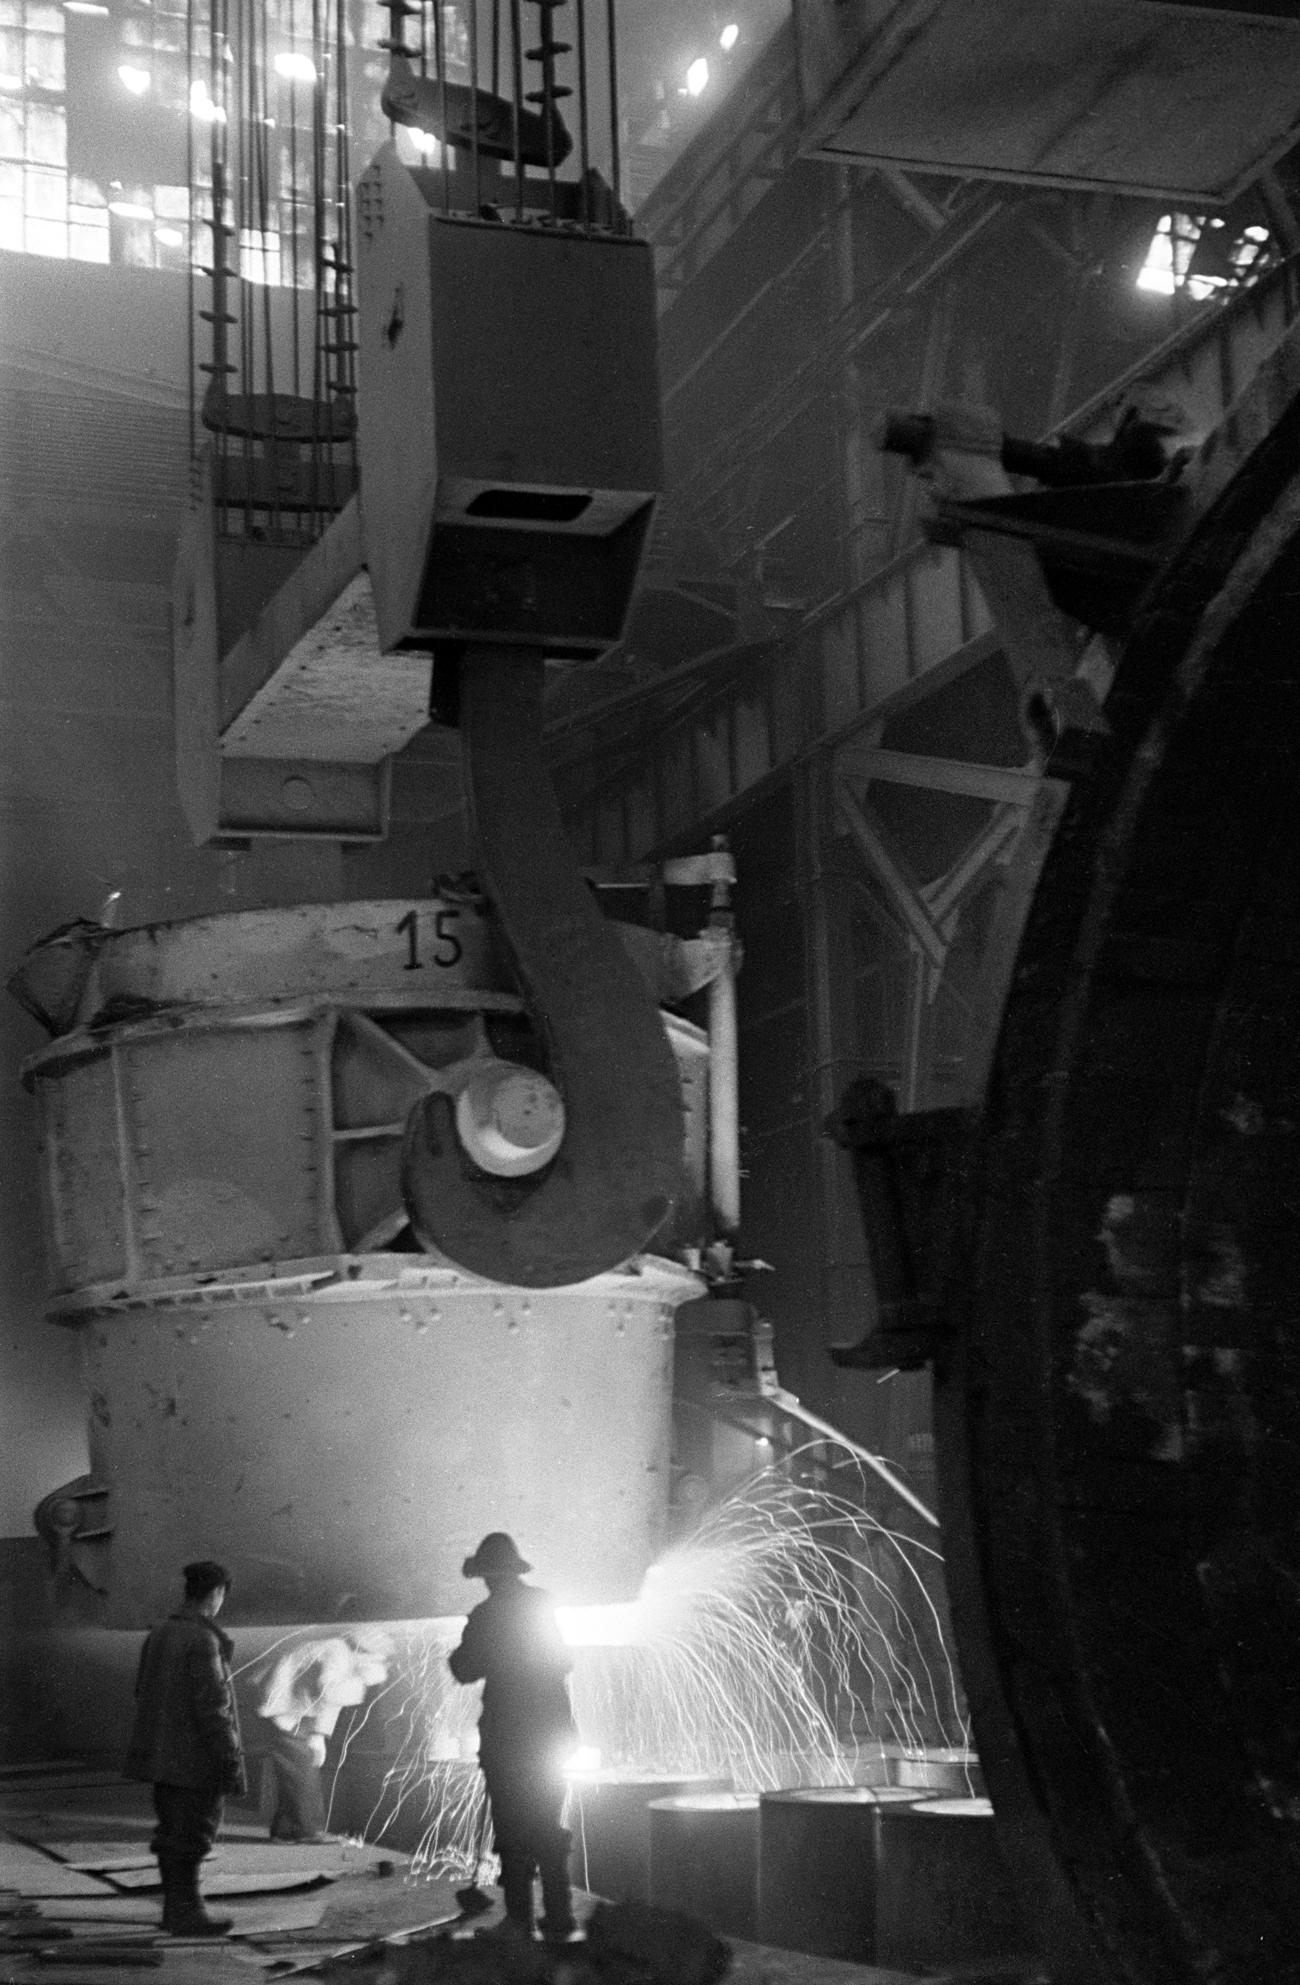 Lo stabilimento di Uralmashzavod a Sverdlovsk (oggi Ekaterinburg), 1944. Fonte: Anatolij Garanin/RIA Novosti